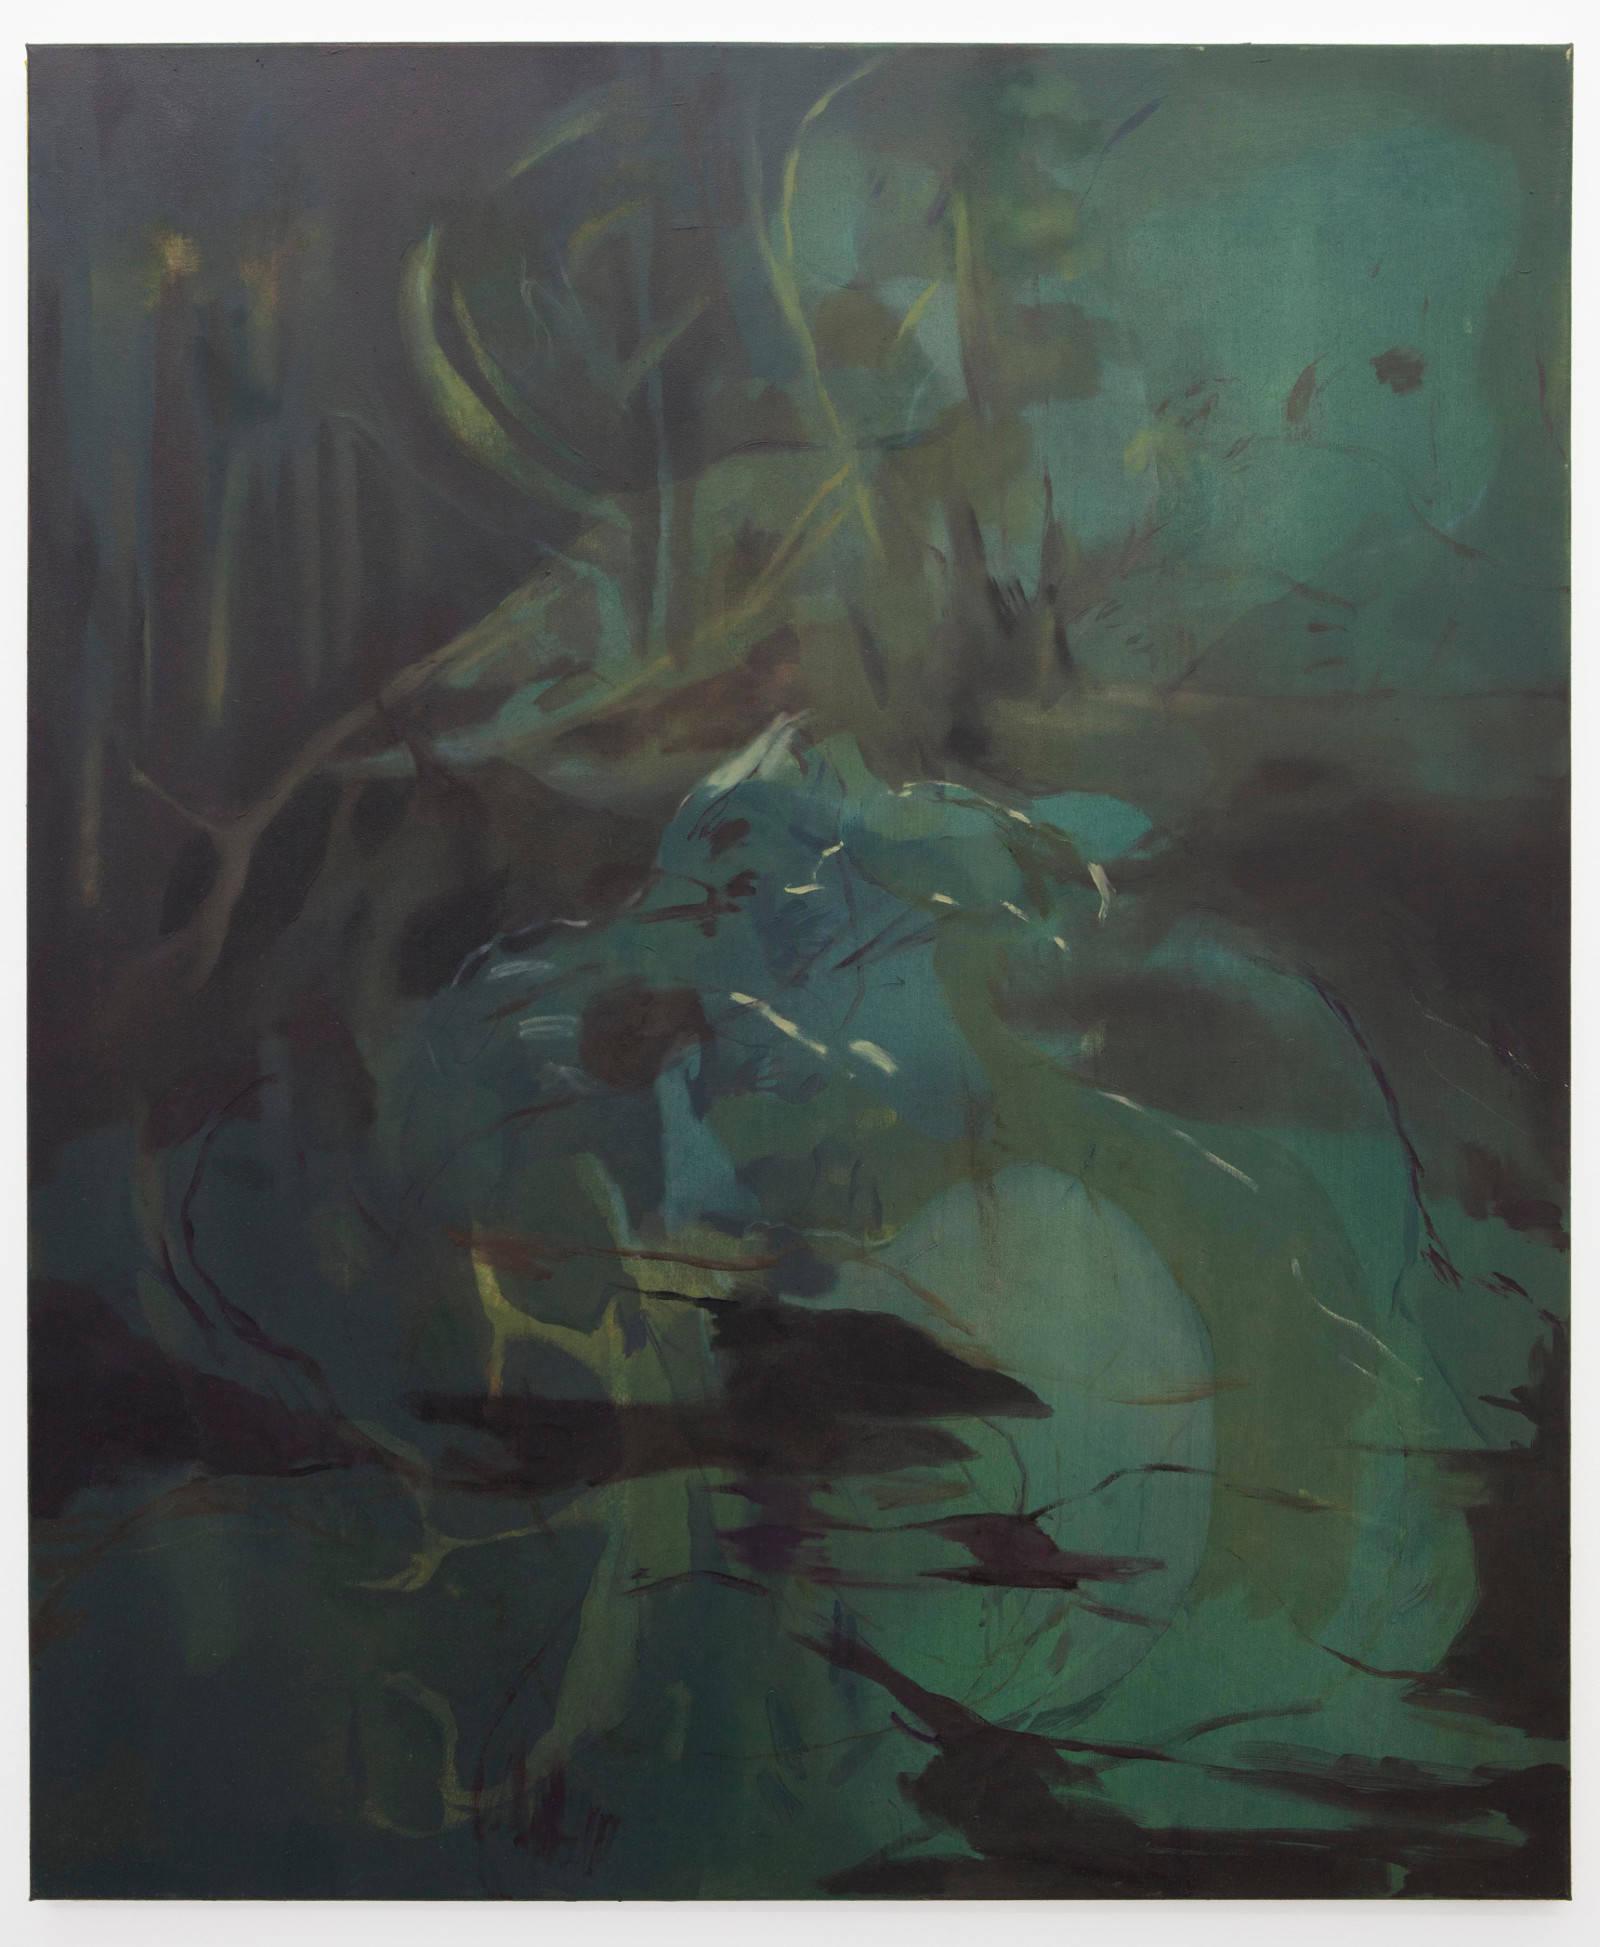 2. Nazzarena Poli Maramotti, Untitled, 2015, olio su tela, 120x100cm